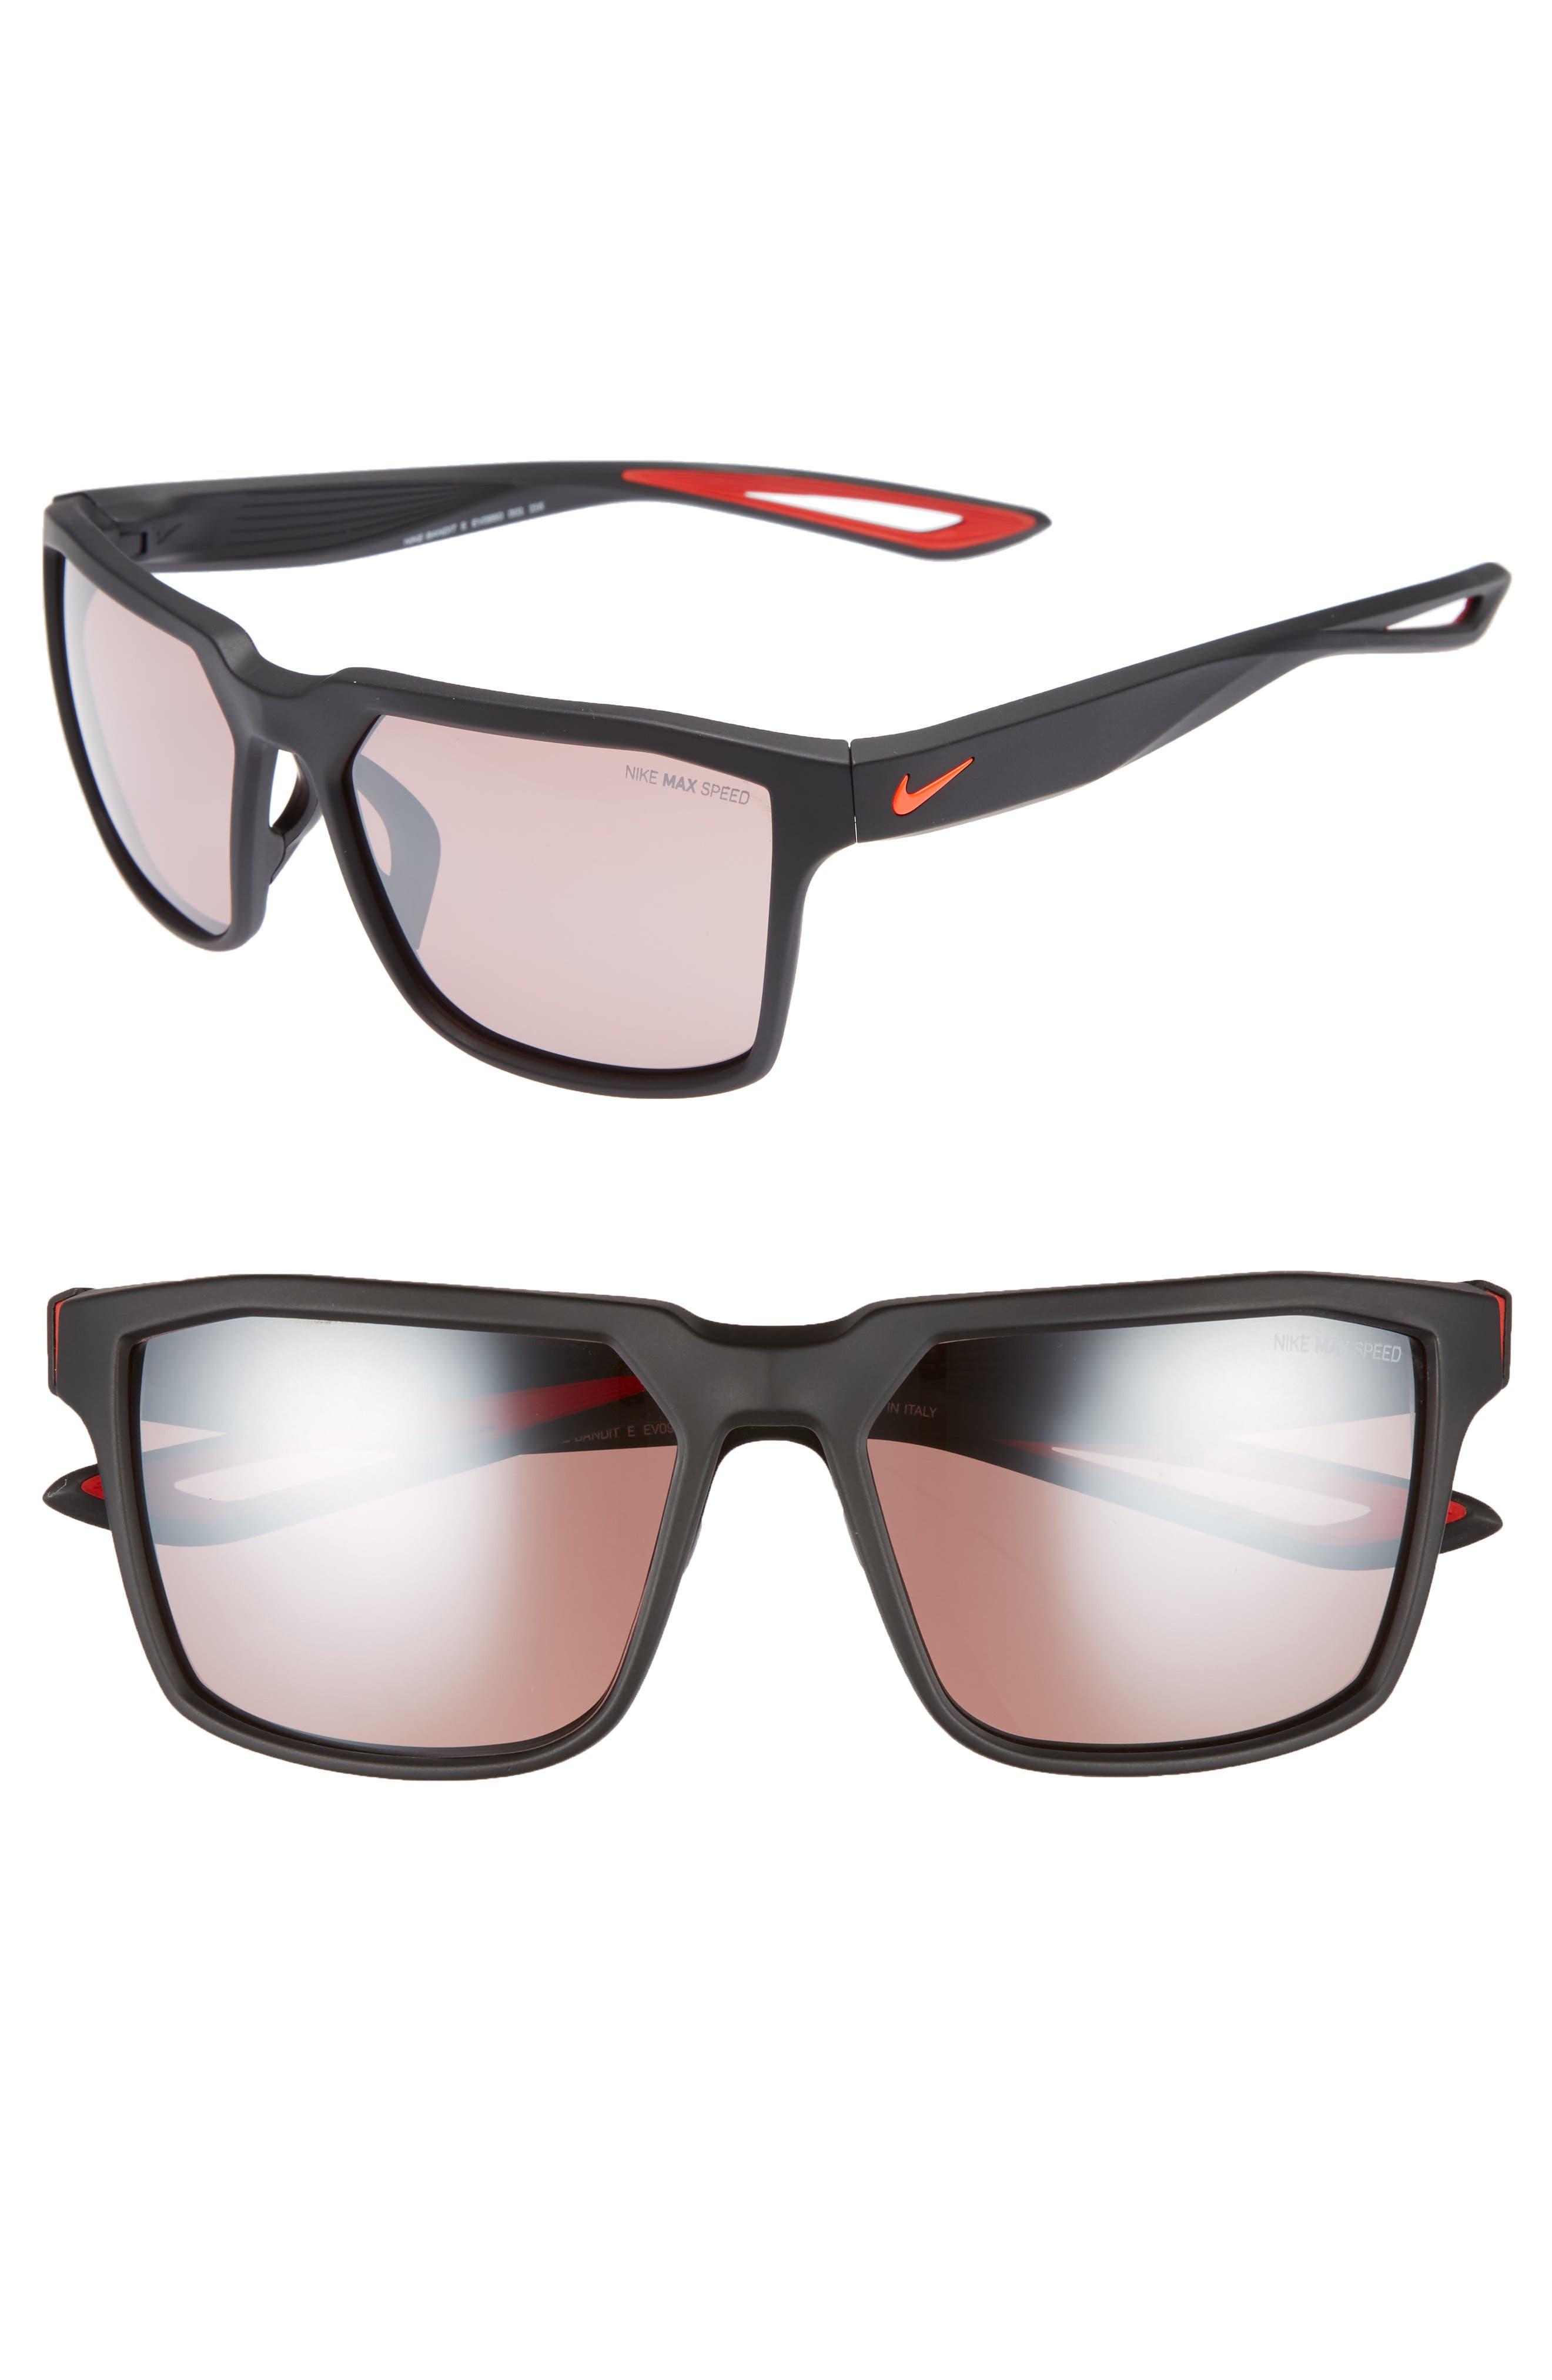 Bandit E 59mm Running Sunglasses,                         Main,                         color, 001